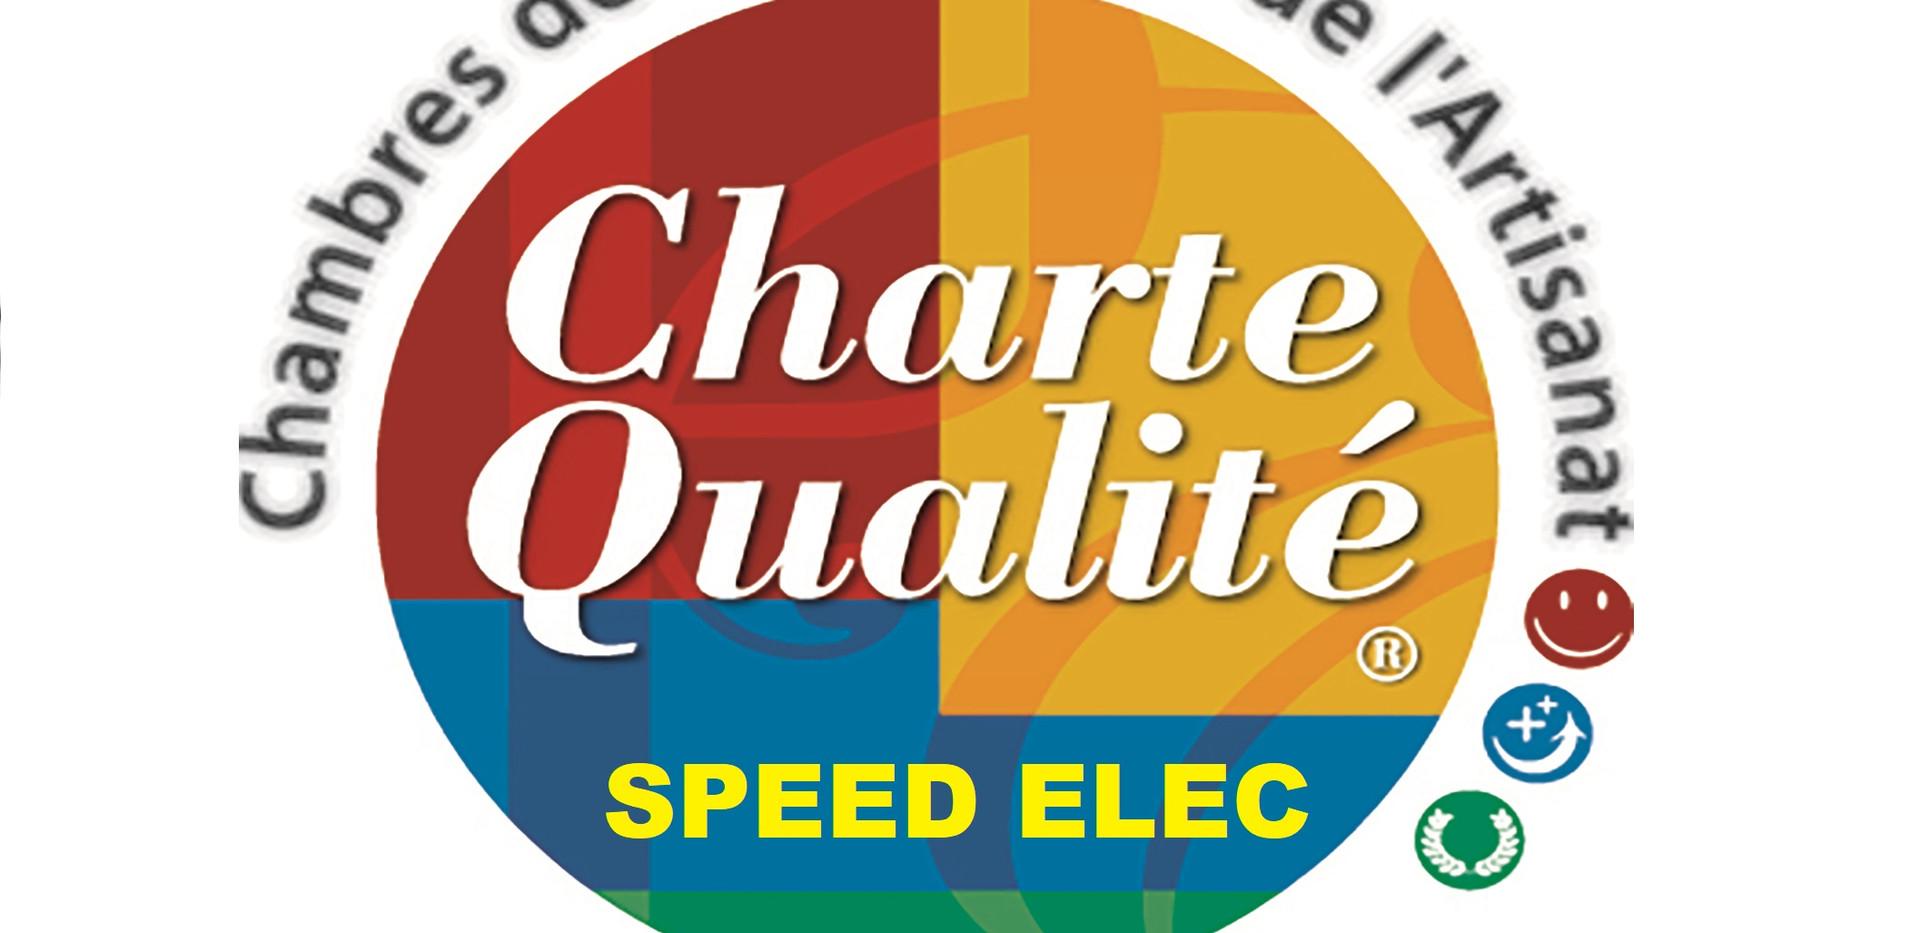 logo-charte-qualité-confiance 2.jpg